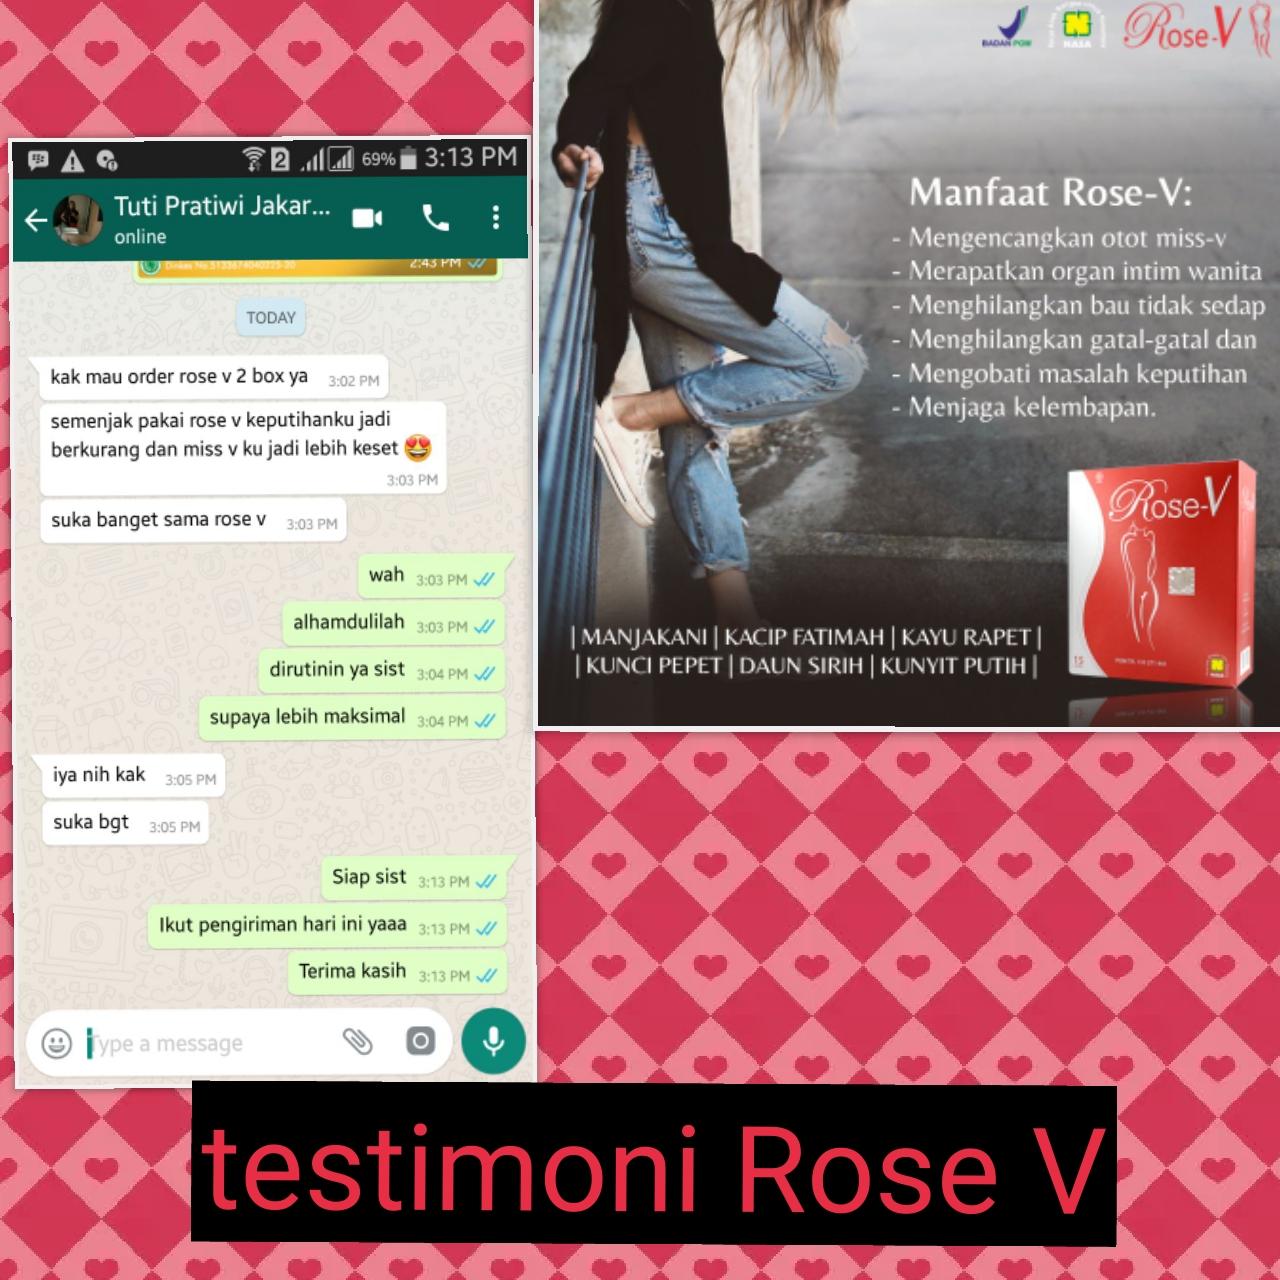 TESTI ROSE V 49